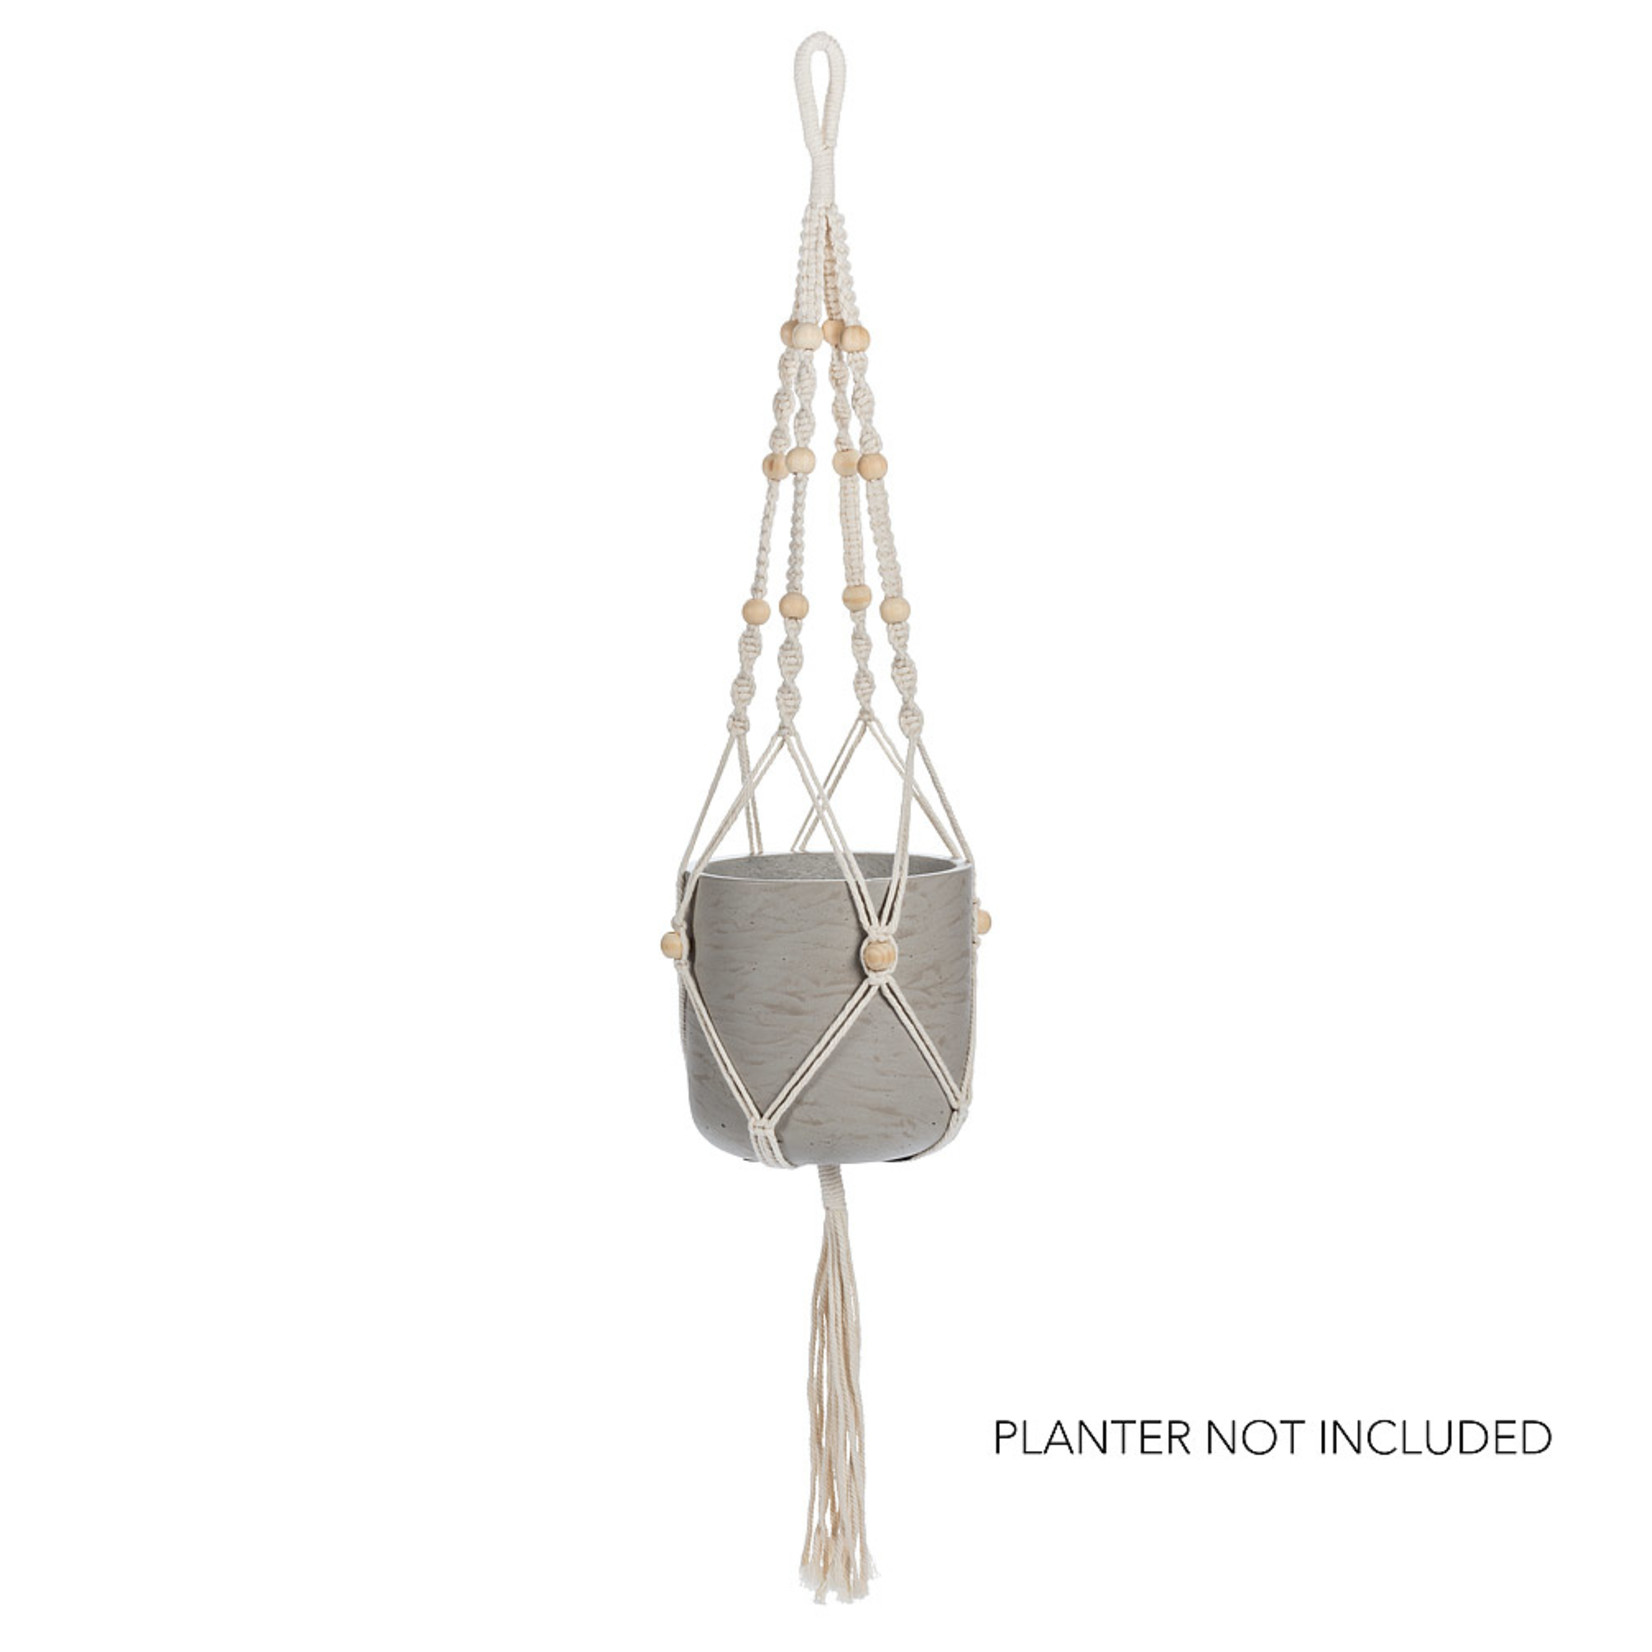 Abbott Planter Hanger with Tail & Beads